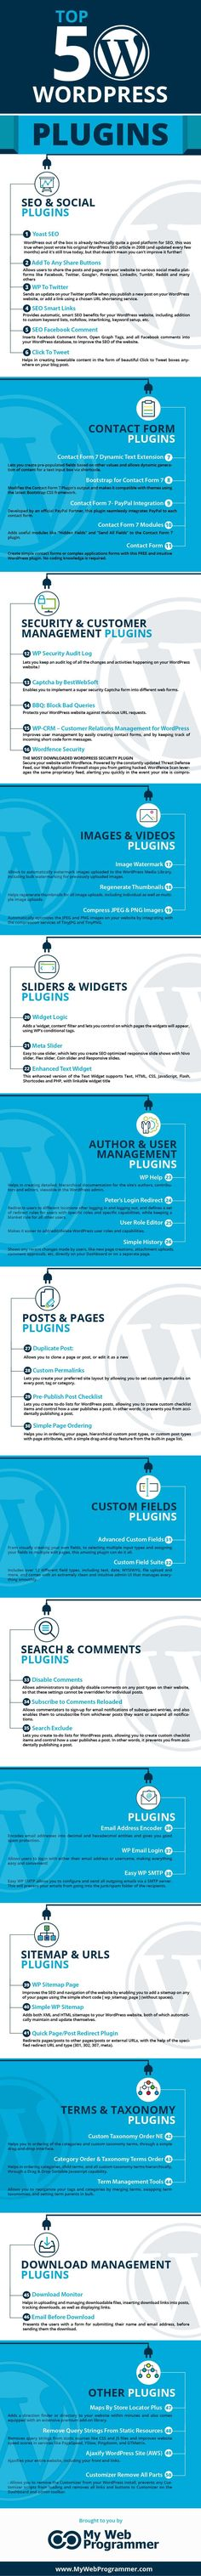 50 WordPress Plugins That Will Improve Your Business Website 50 پلاگین پر استفاده در ورد پرس http://www.fazelpc.ir